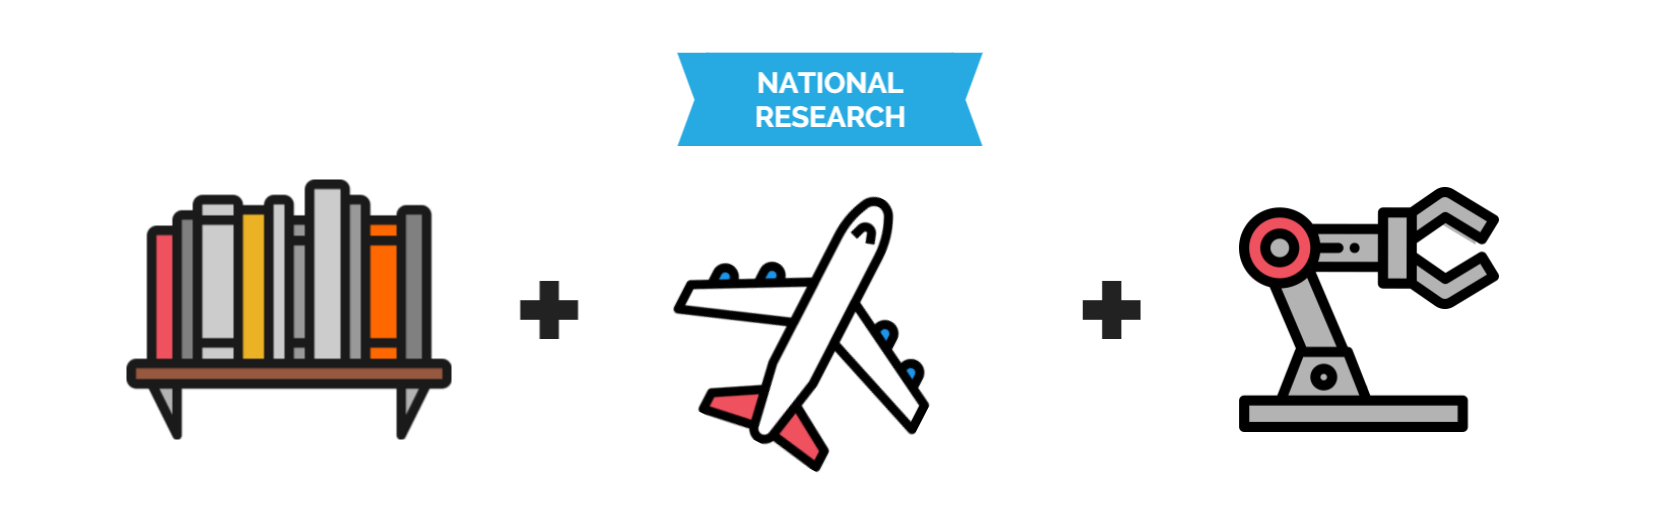 National Research - Internationalisation, Transport, Robotics.png